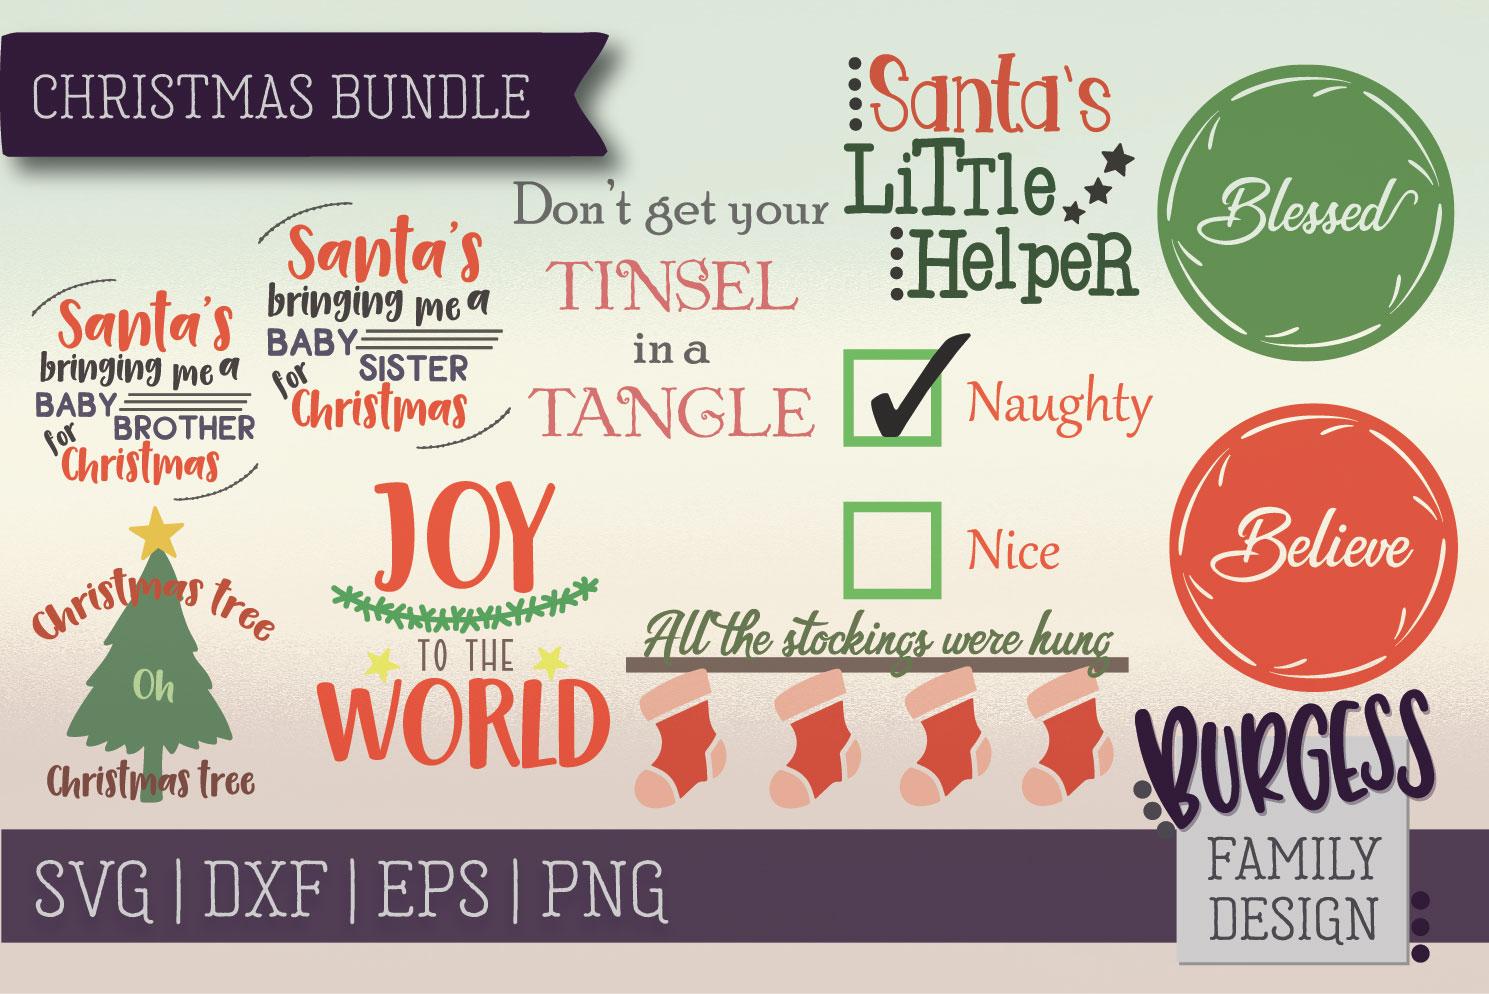 The starter bundle - Over 200 Designs | SVG DXF EPS PNG example image 7